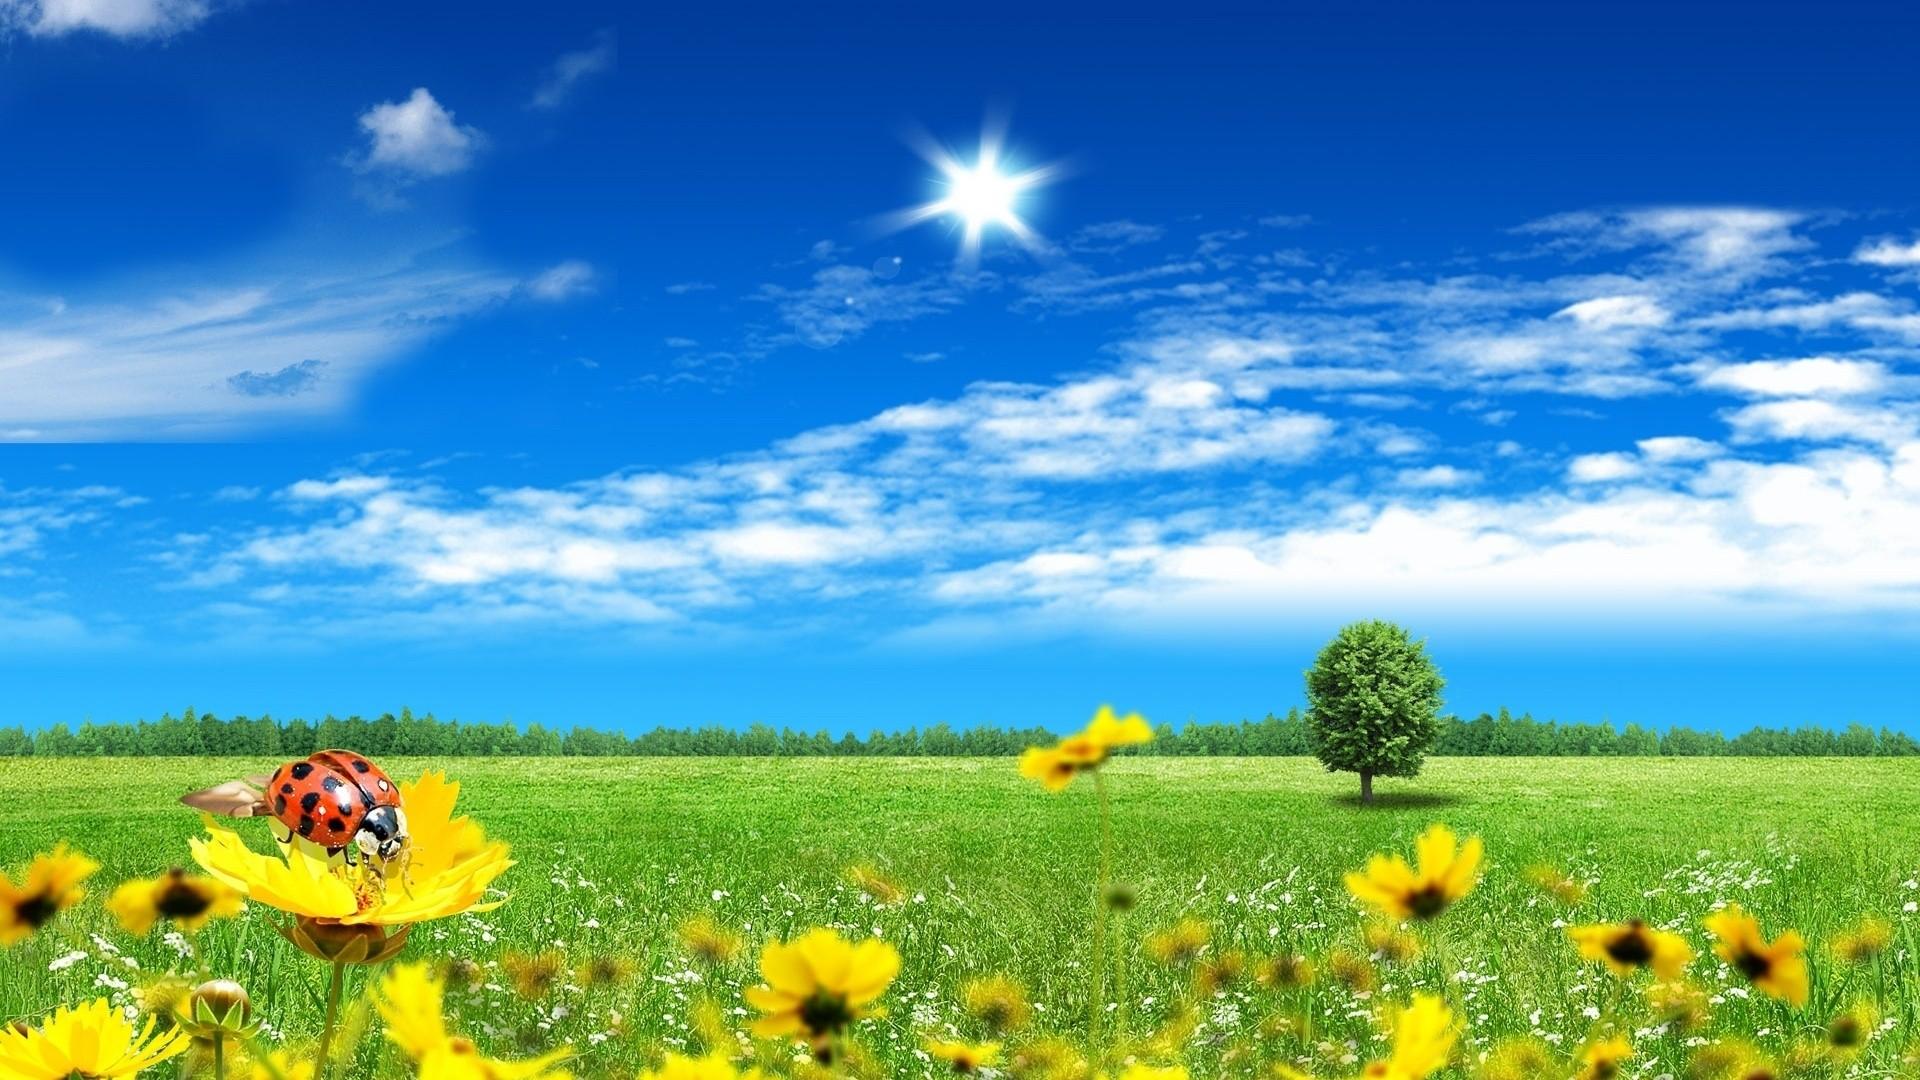 Beautiful Nature Spring Scenes Wallpaper HD 1920x1080